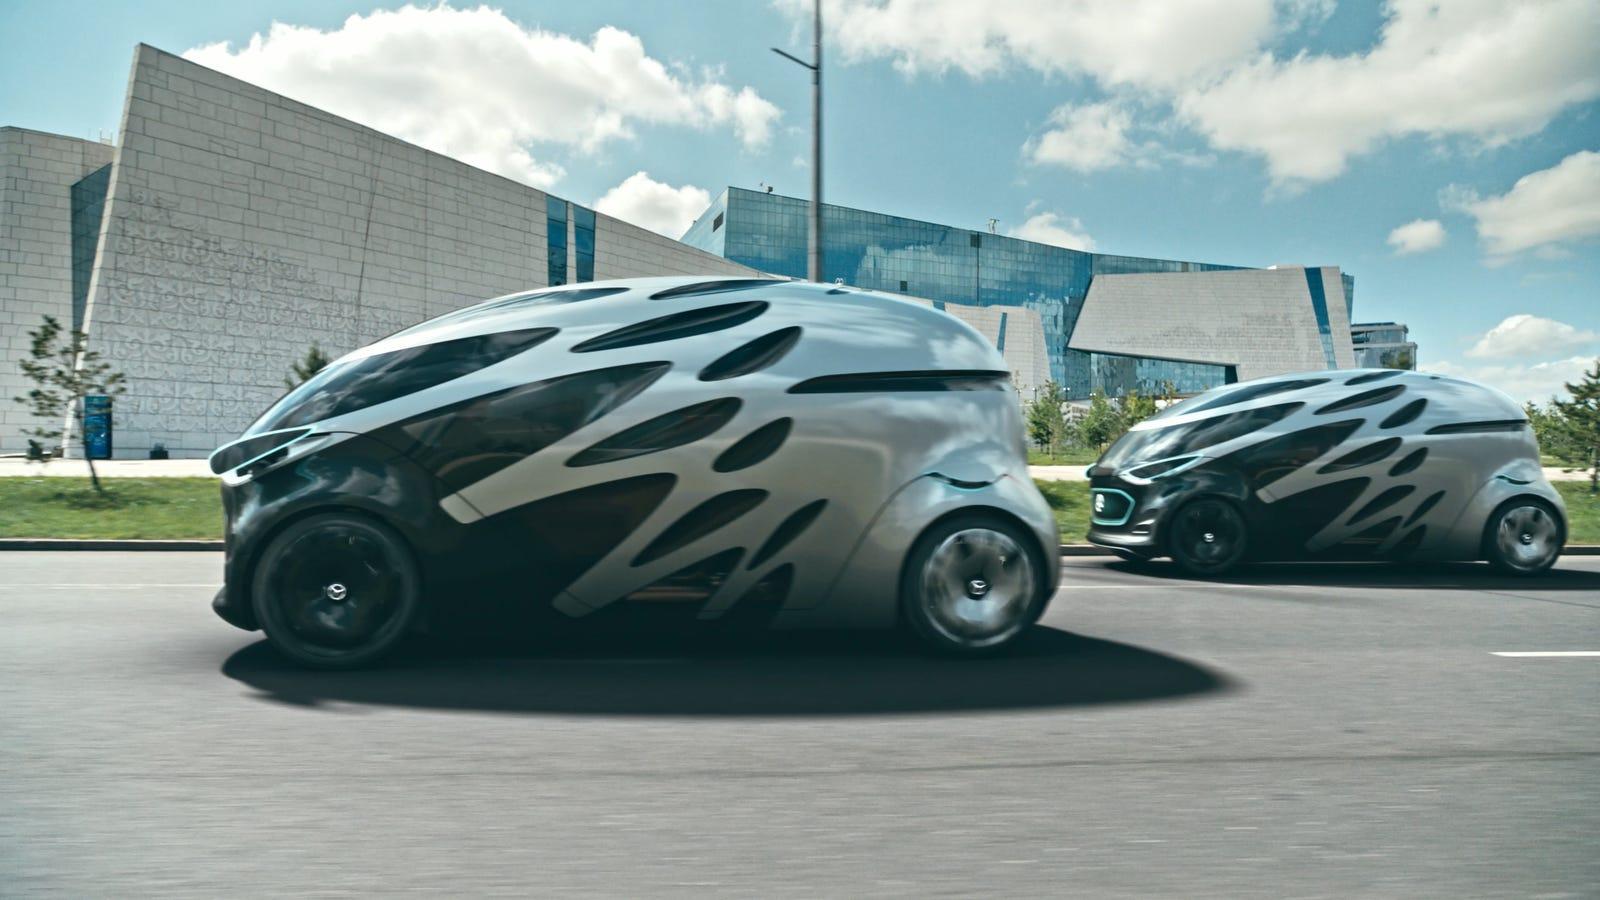 Cars Are the Future